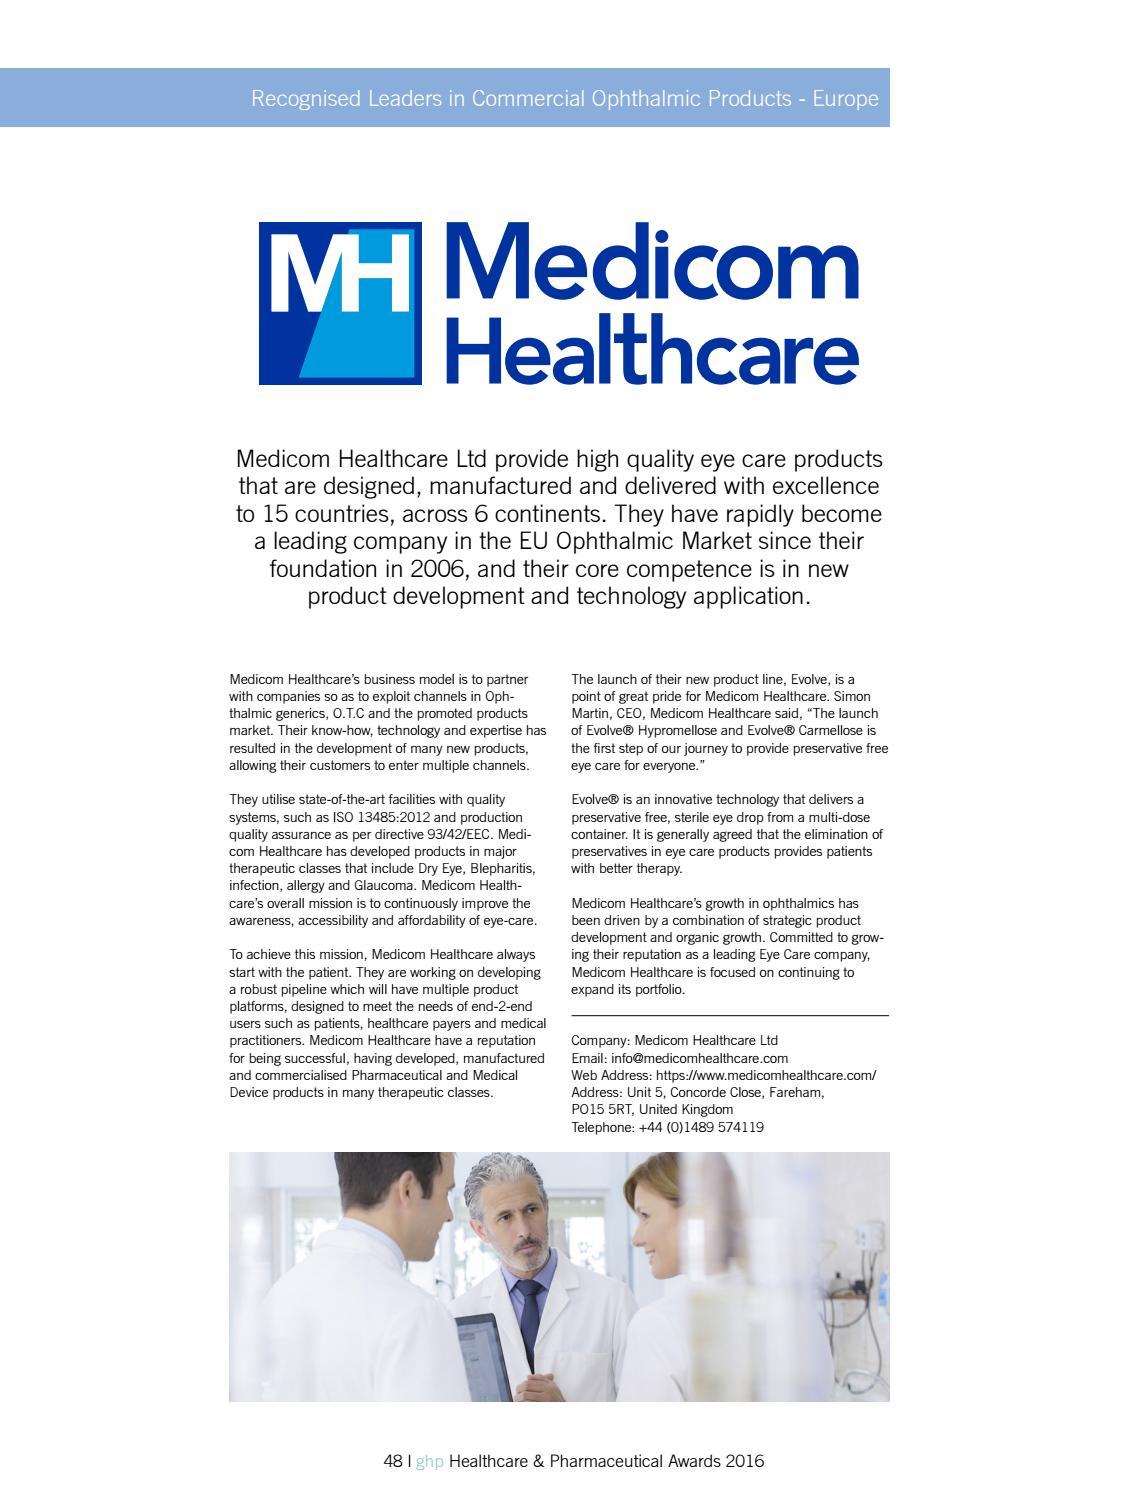 2016 Healthcare & Pharmaceutical awards by AI Global Media